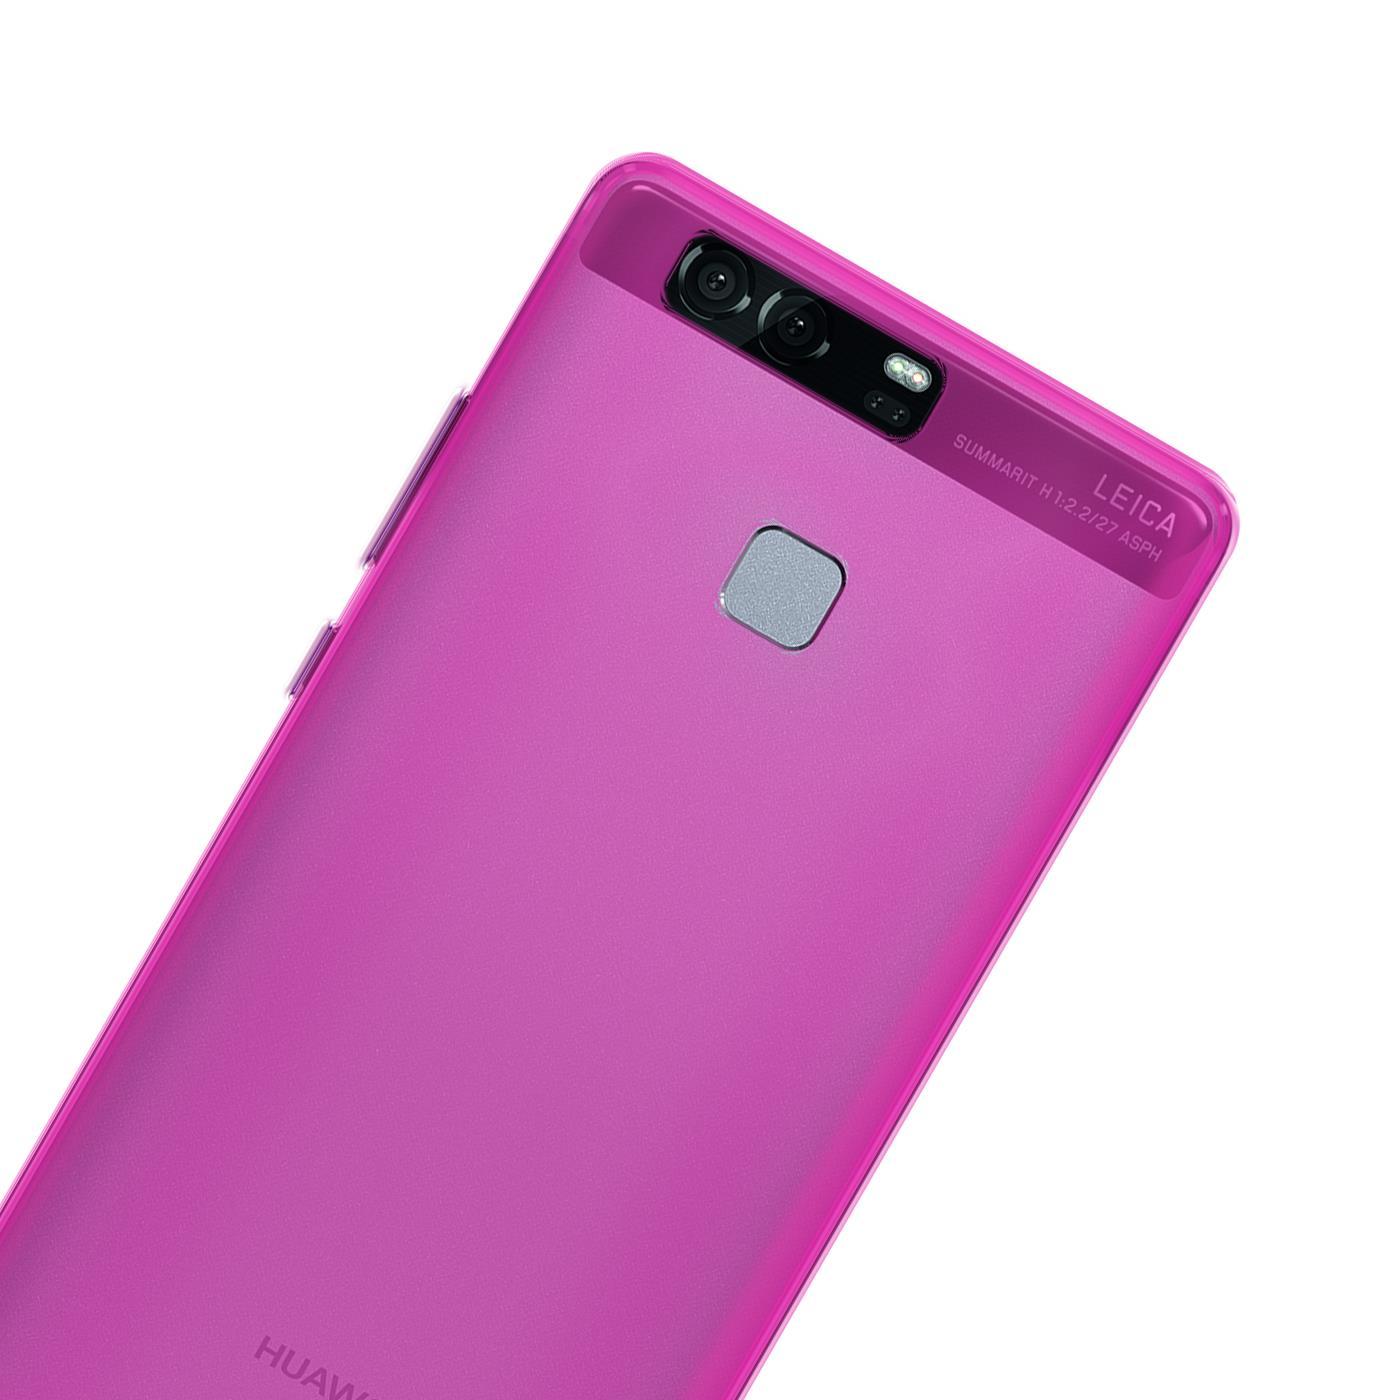 Huawei-p9-Duenn-Silikon-Klar-Case-Cover-Ultra-Slim-Stossfeste-Gel-Rueckseite Indexbild 26